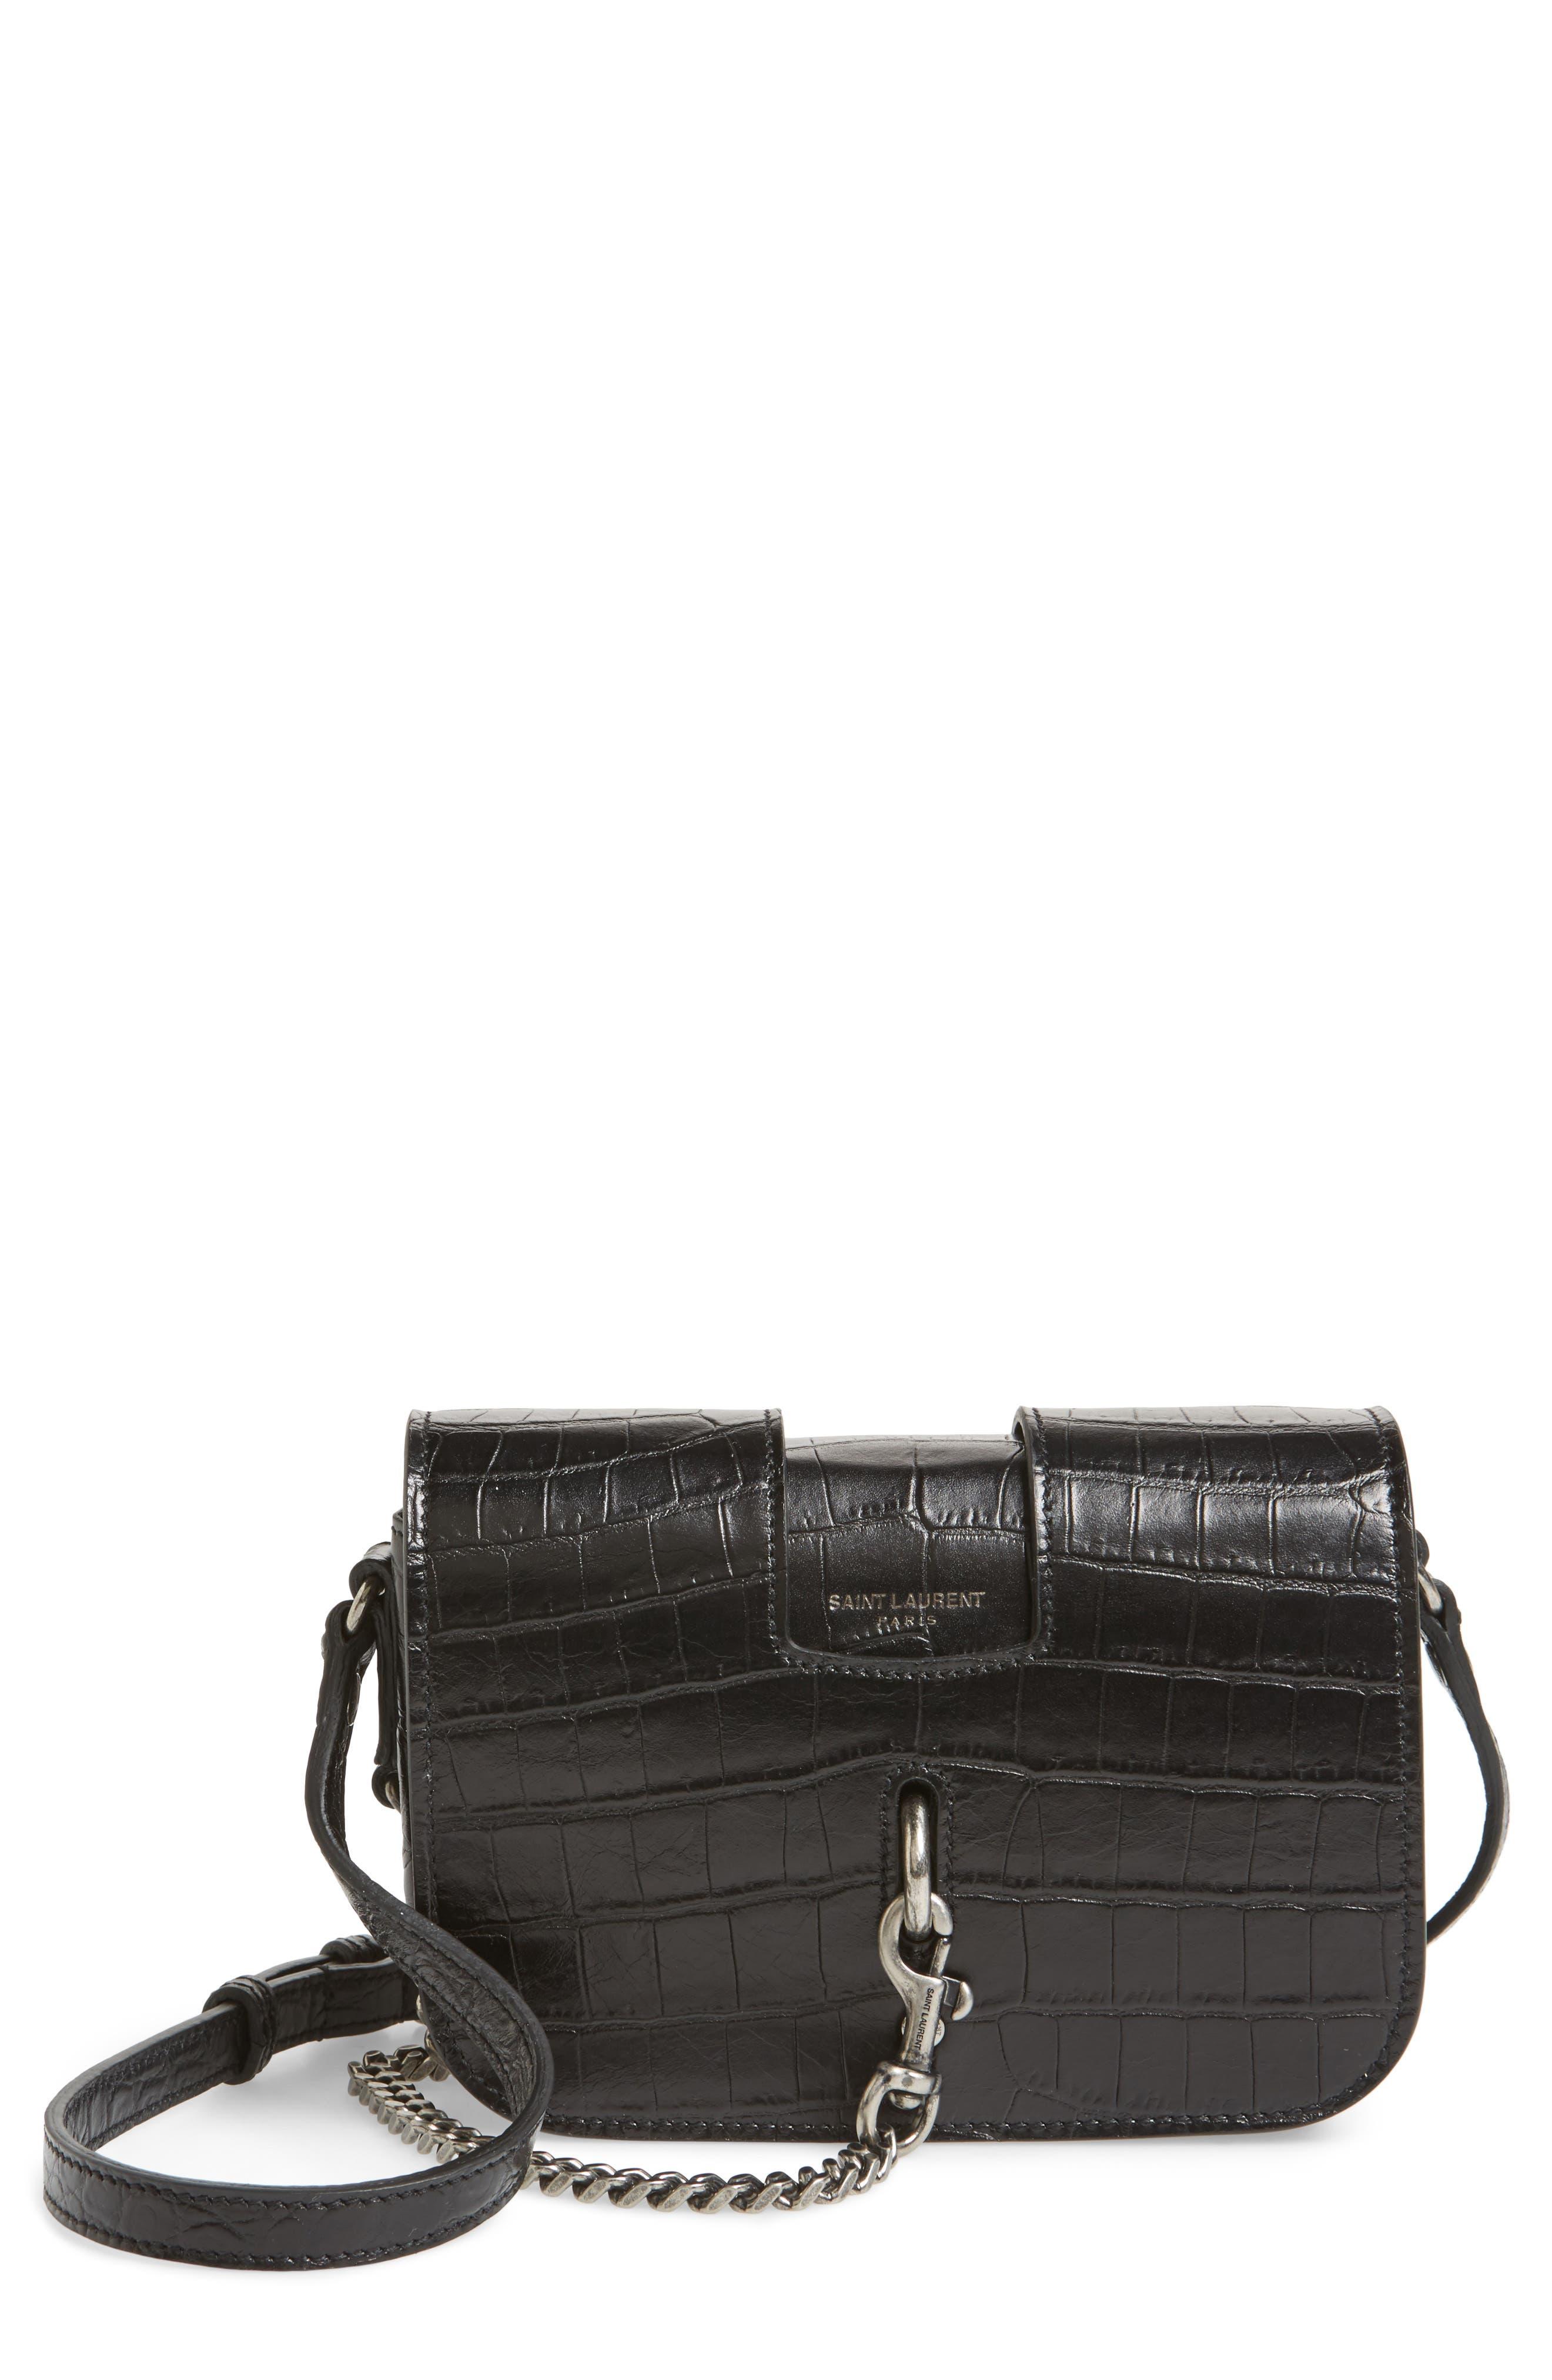 Croc Embossed Leather Crossbody Bag,                             Main thumbnail 1, color,                             Noir